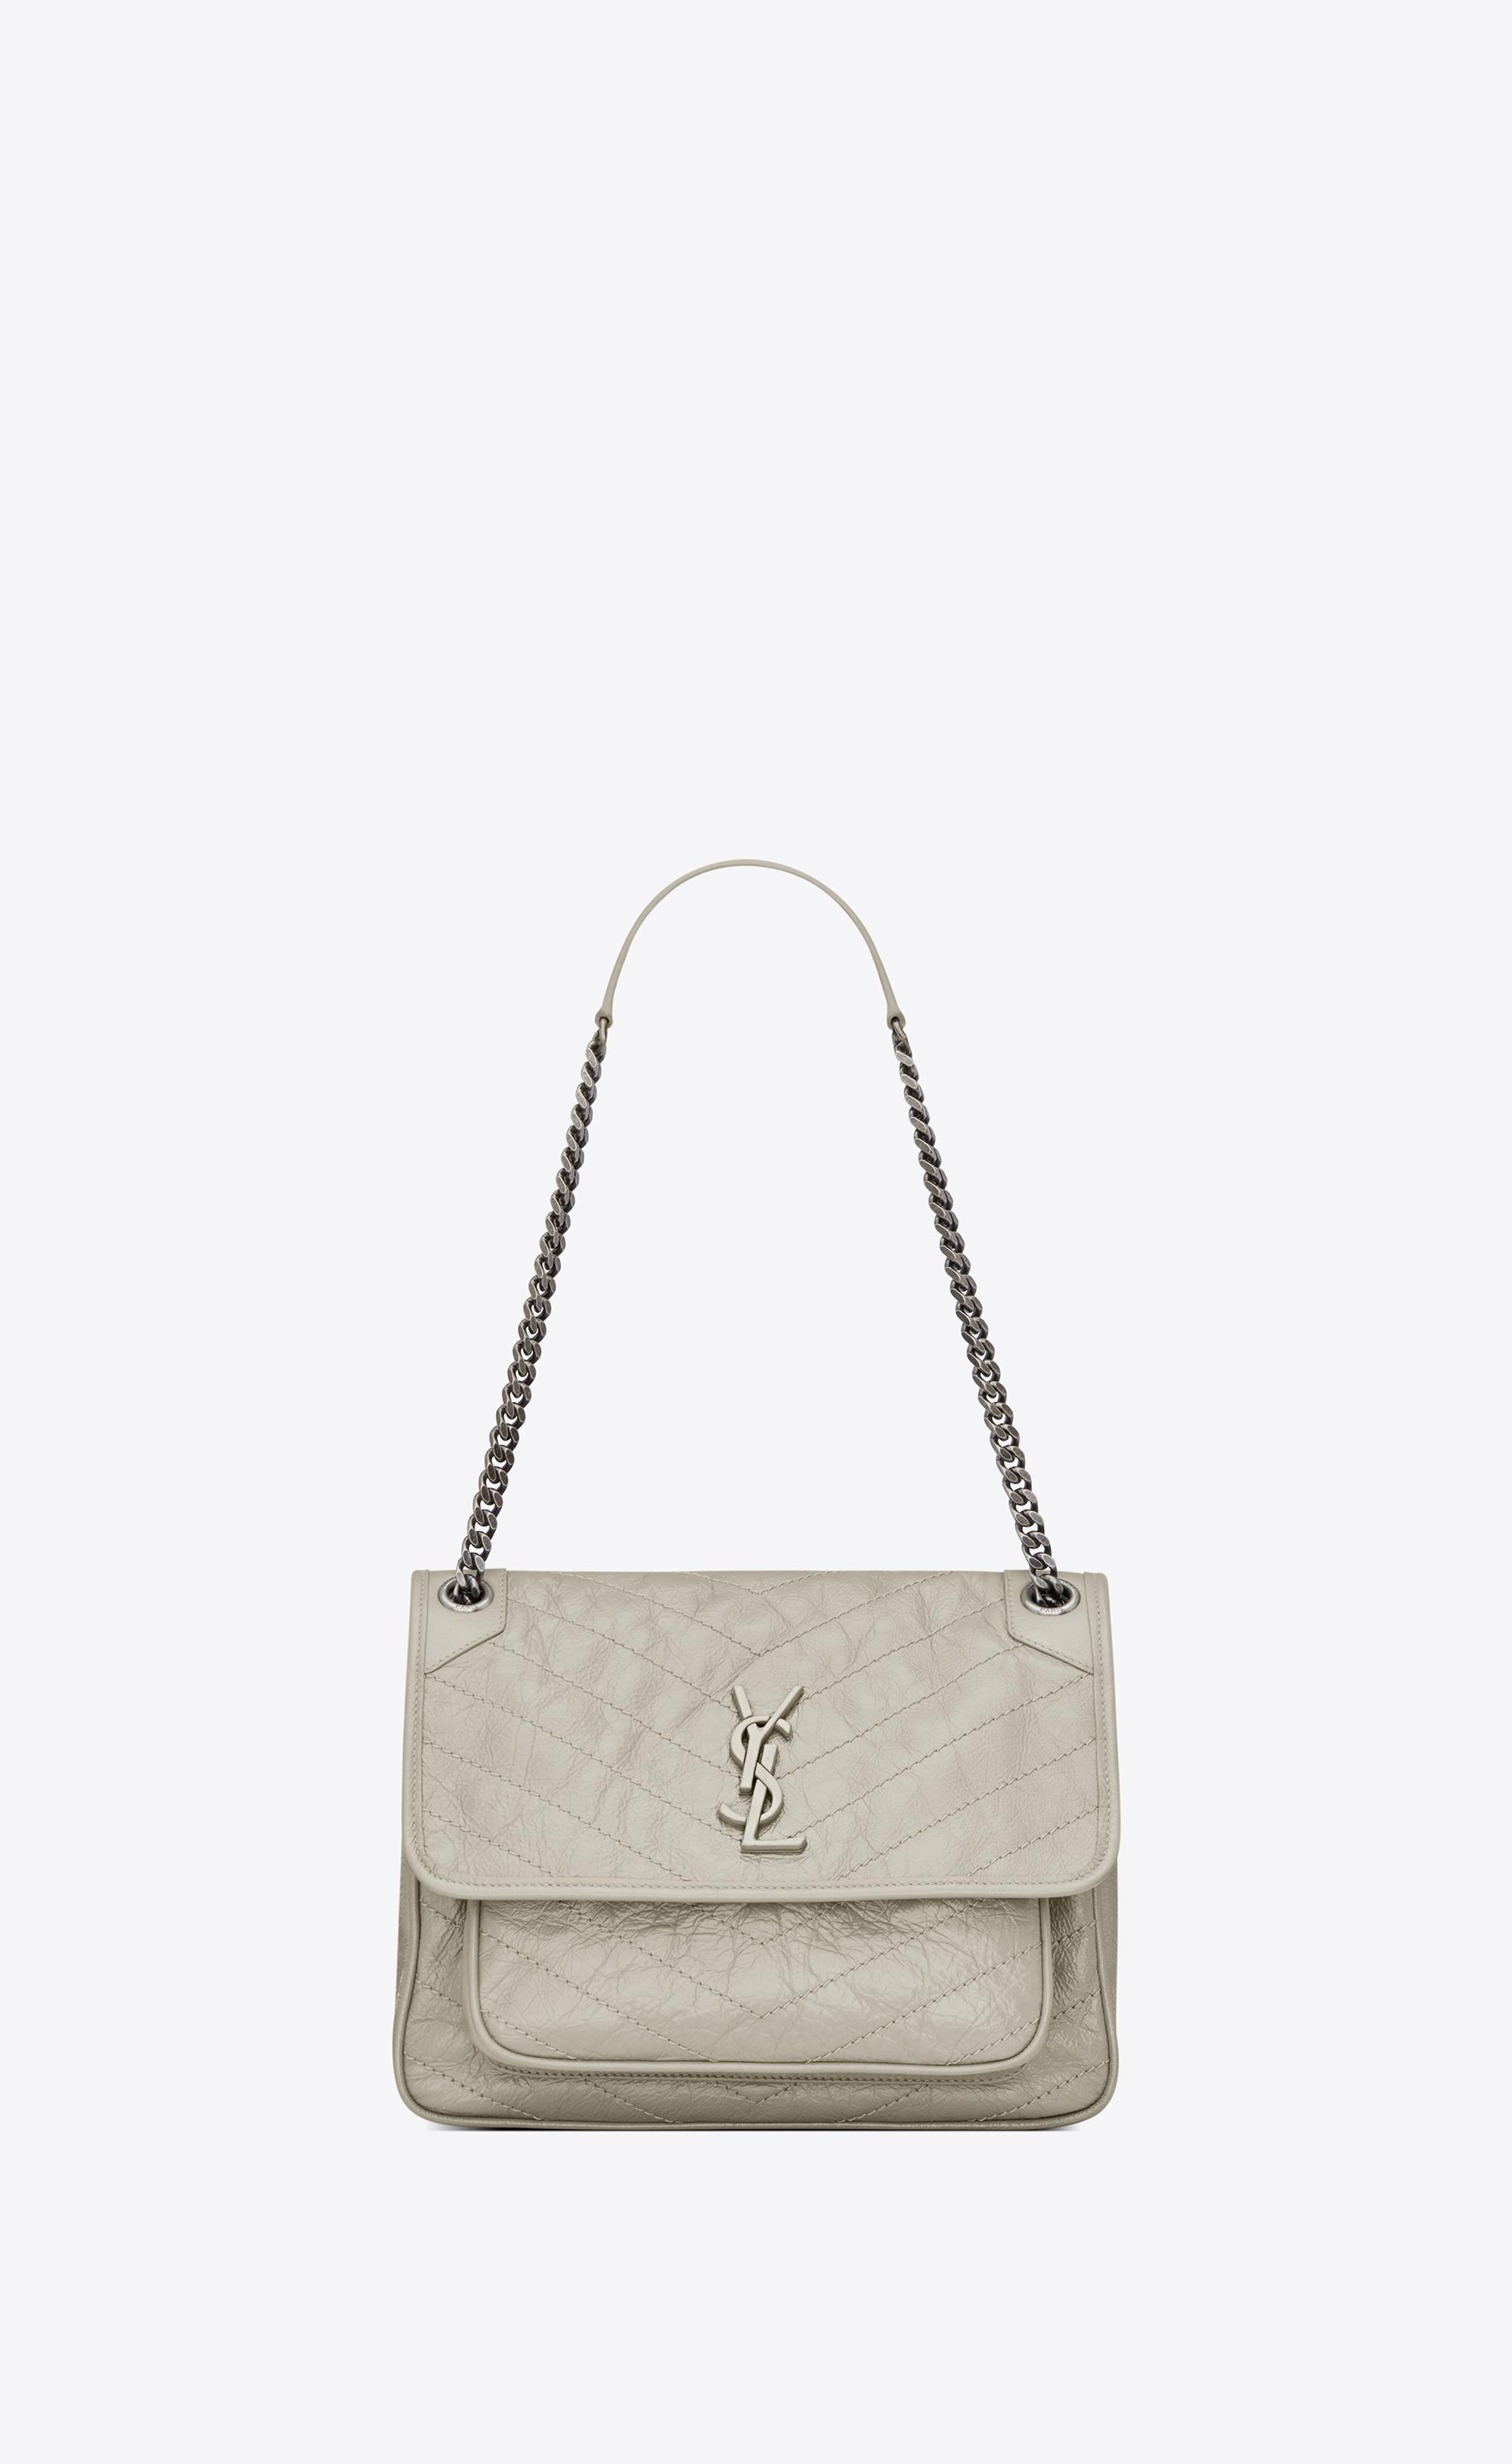 f9a275a73af Saint Laurent. Women s Medium Niki Bag